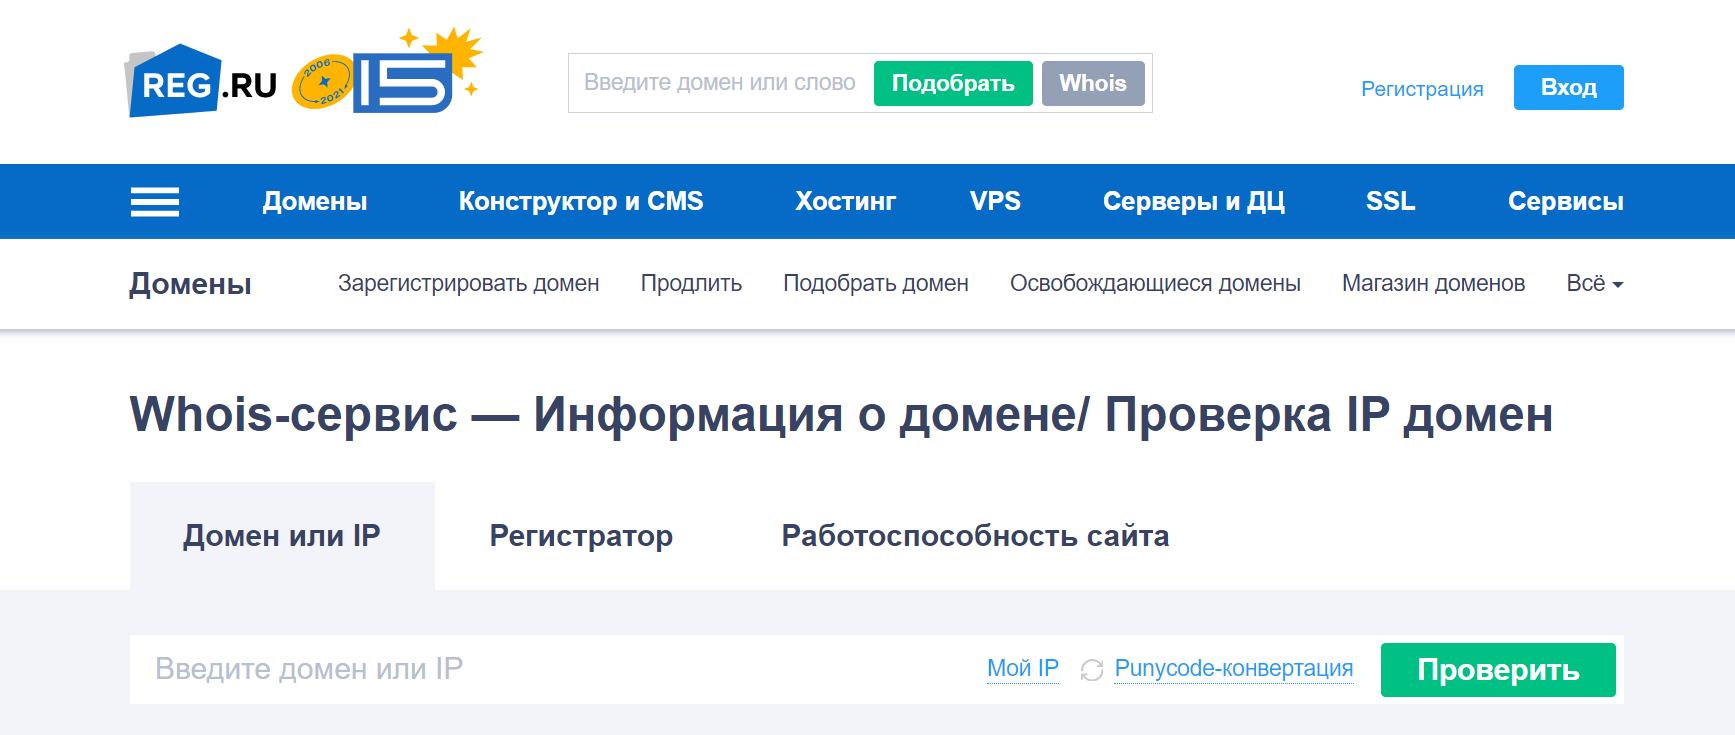 Интерфейс Whois–service REG.RU